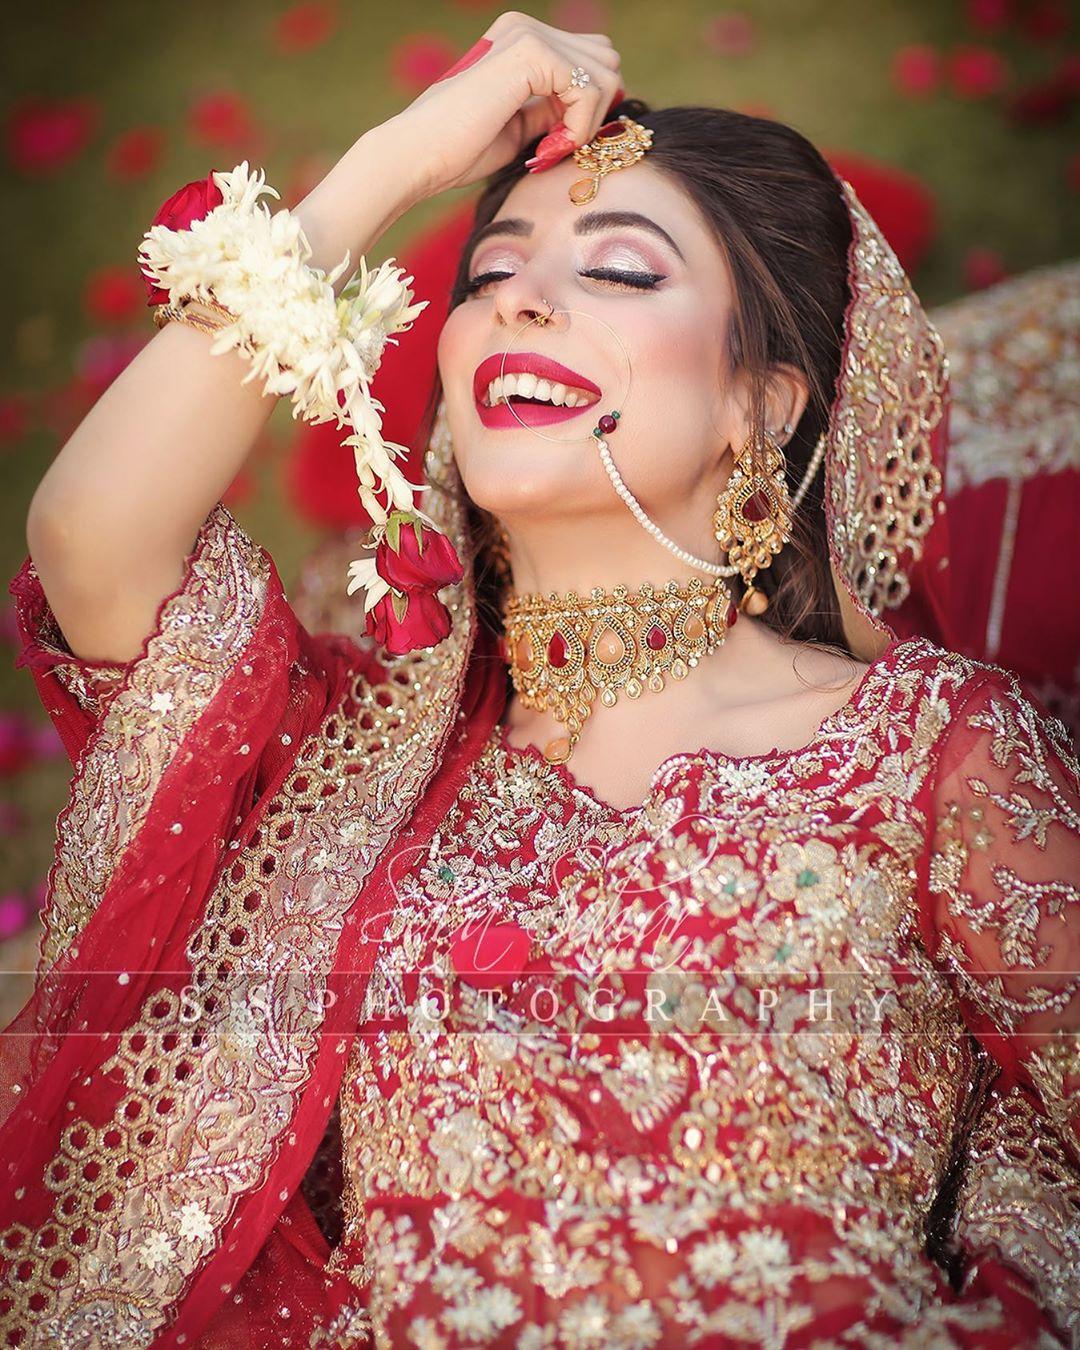 Urwa Hocane Looks Gorgeous in the Latest Bridal Photo Shoot